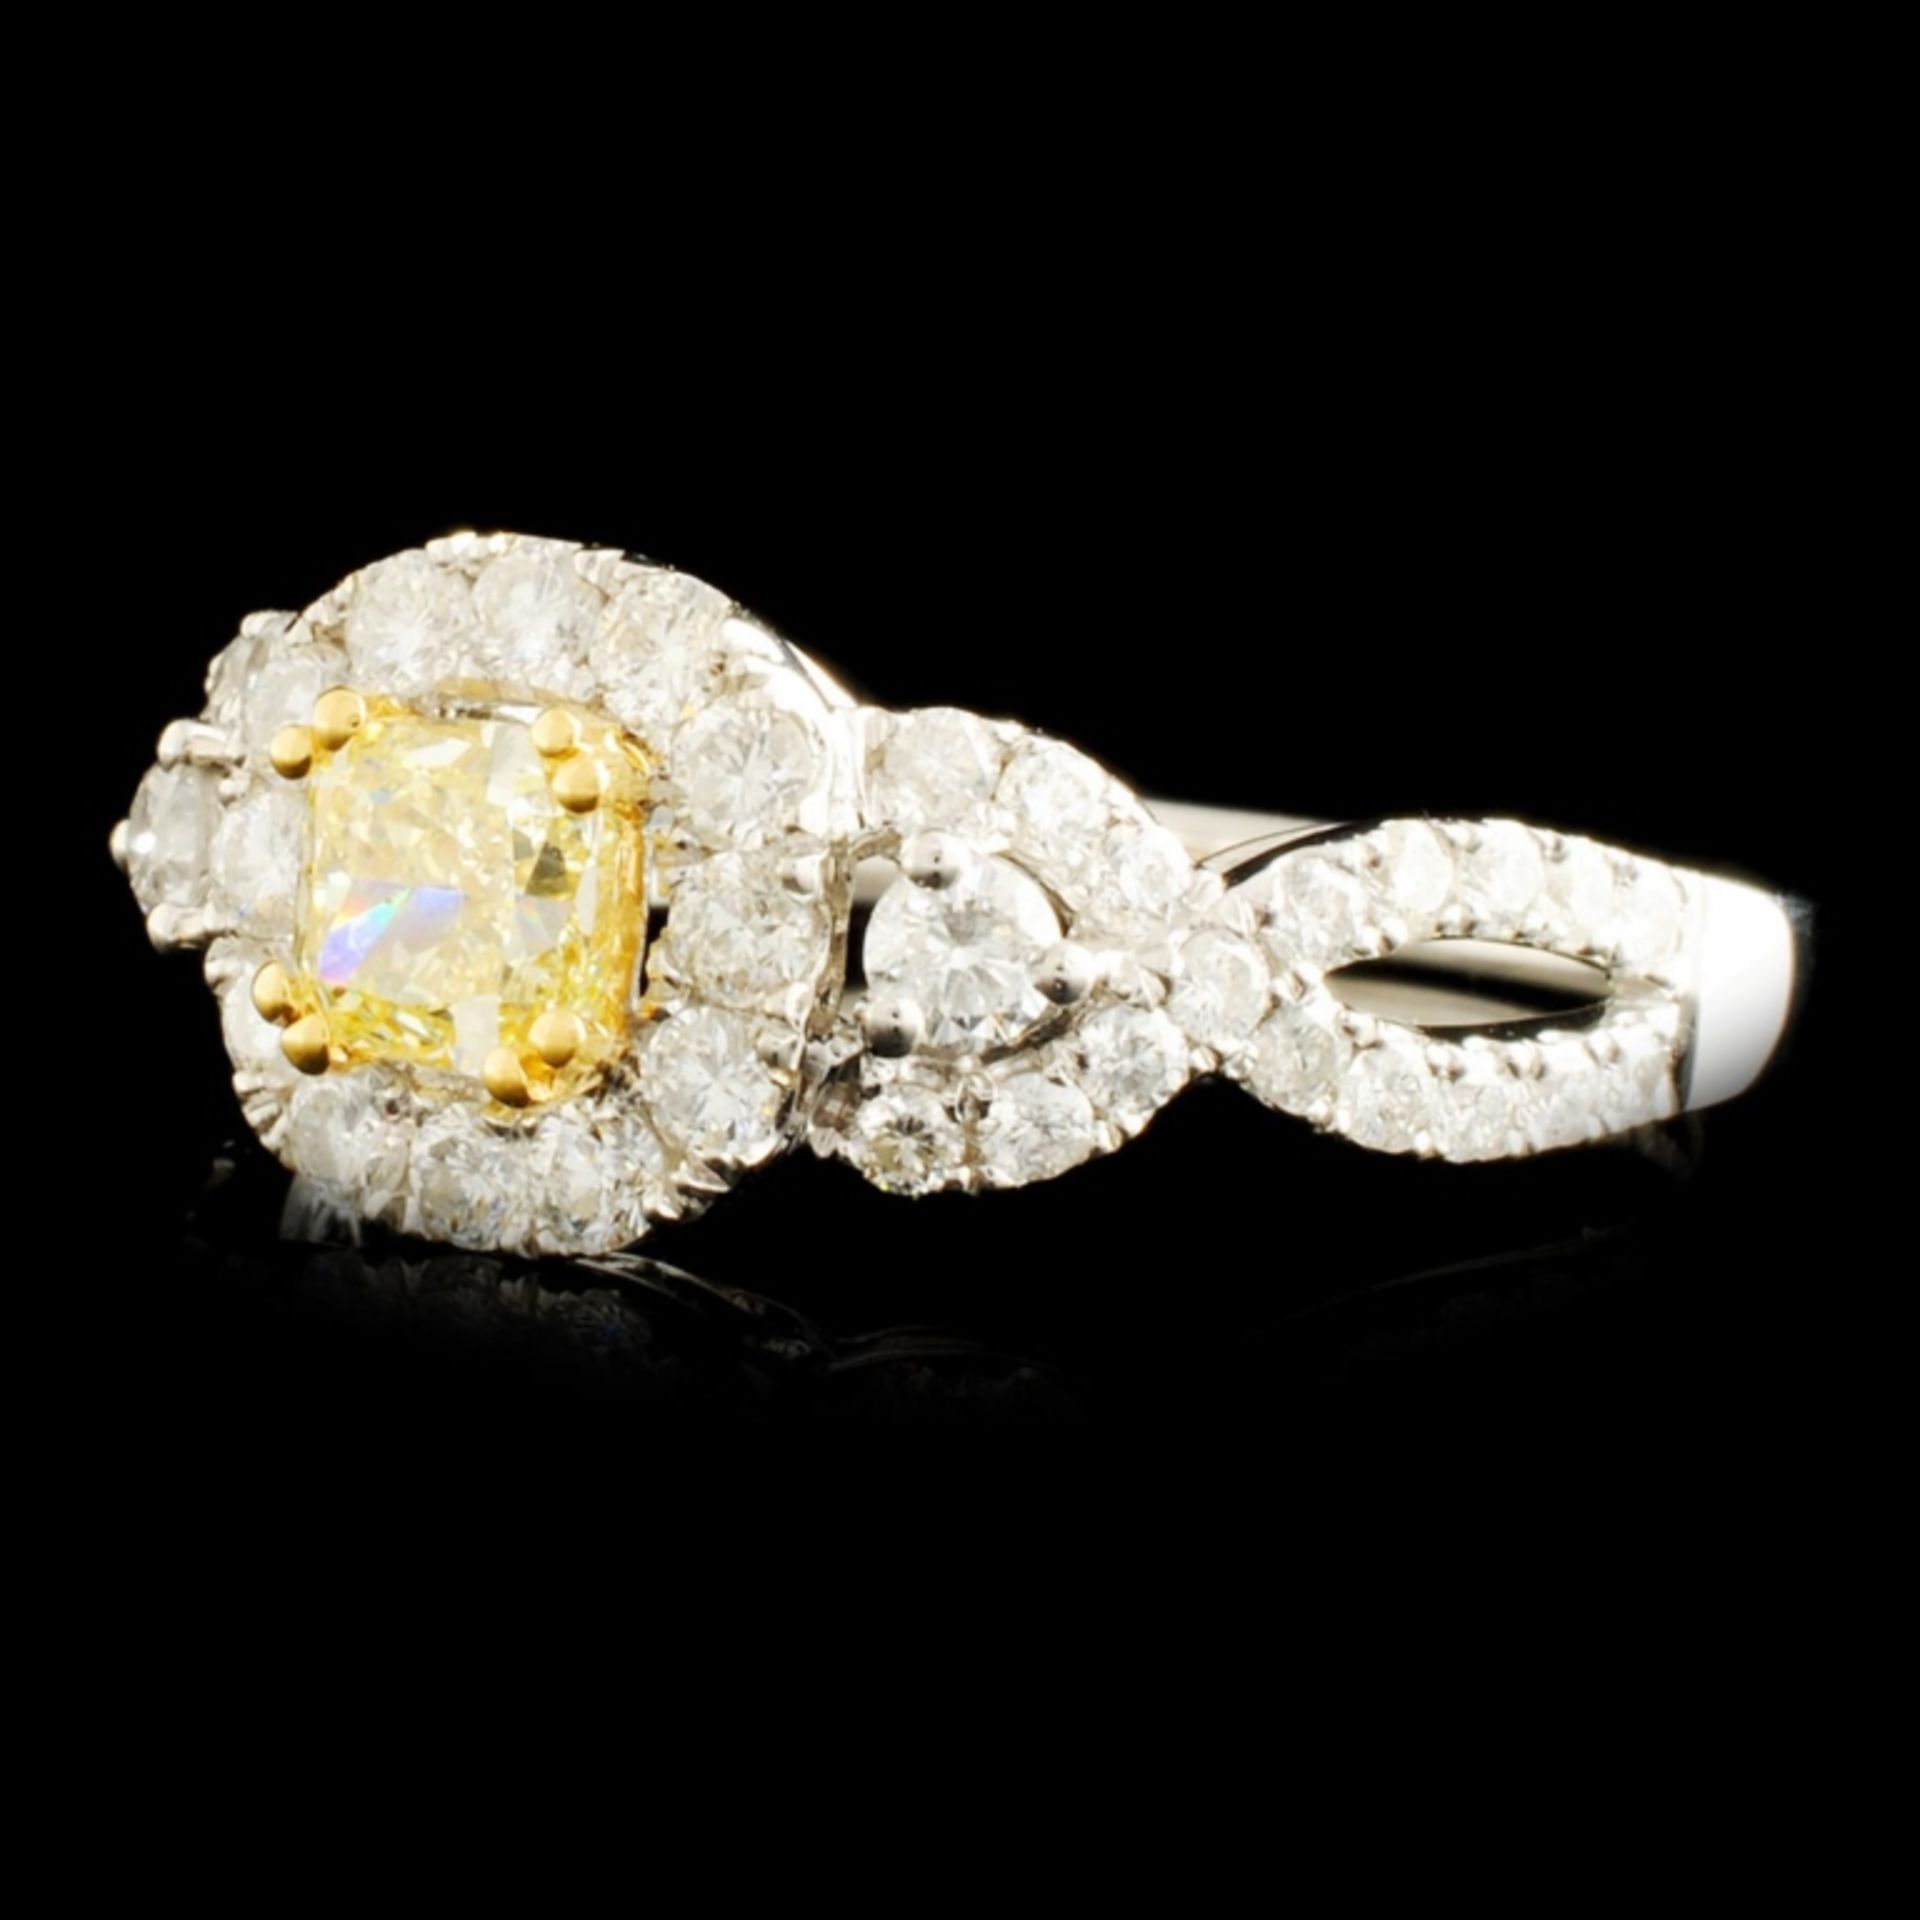 18K Gold 1.31ctw Diamond Ring - Image 2 of 5